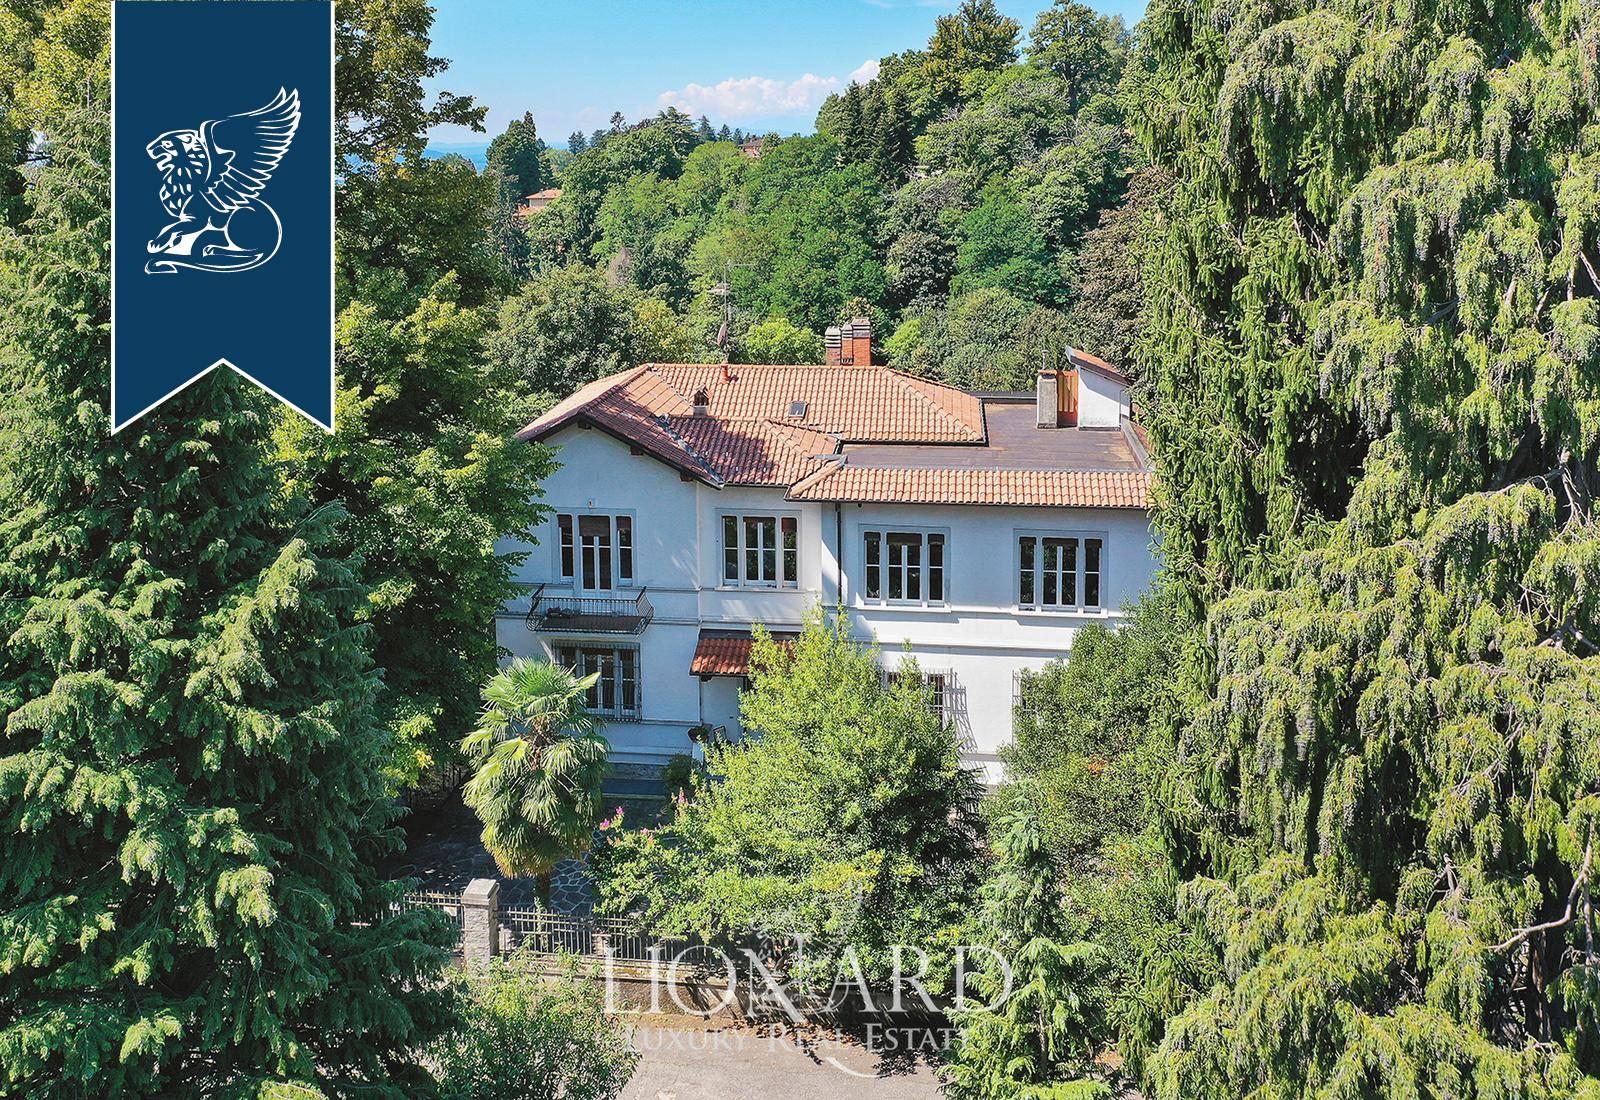 Villa in Vendita a Varese: 0 locali, 600 mq - Foto 2